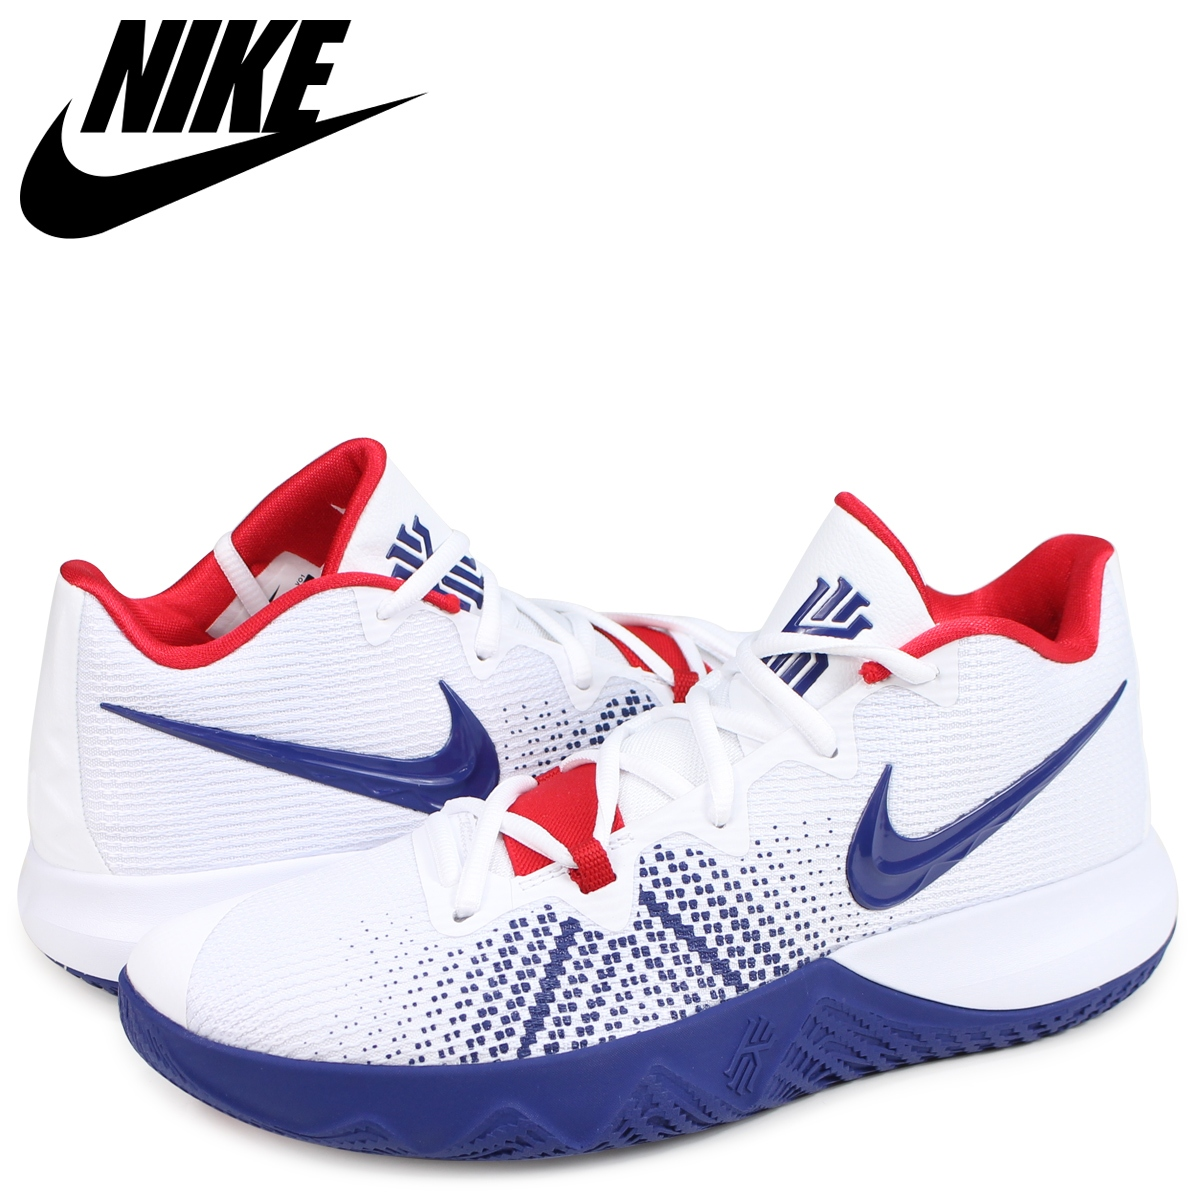 325493bbc3ef SneaK Online Shop  Nike NIKE chi Lee sneakers men KYRIE FLYTRAP EP ...